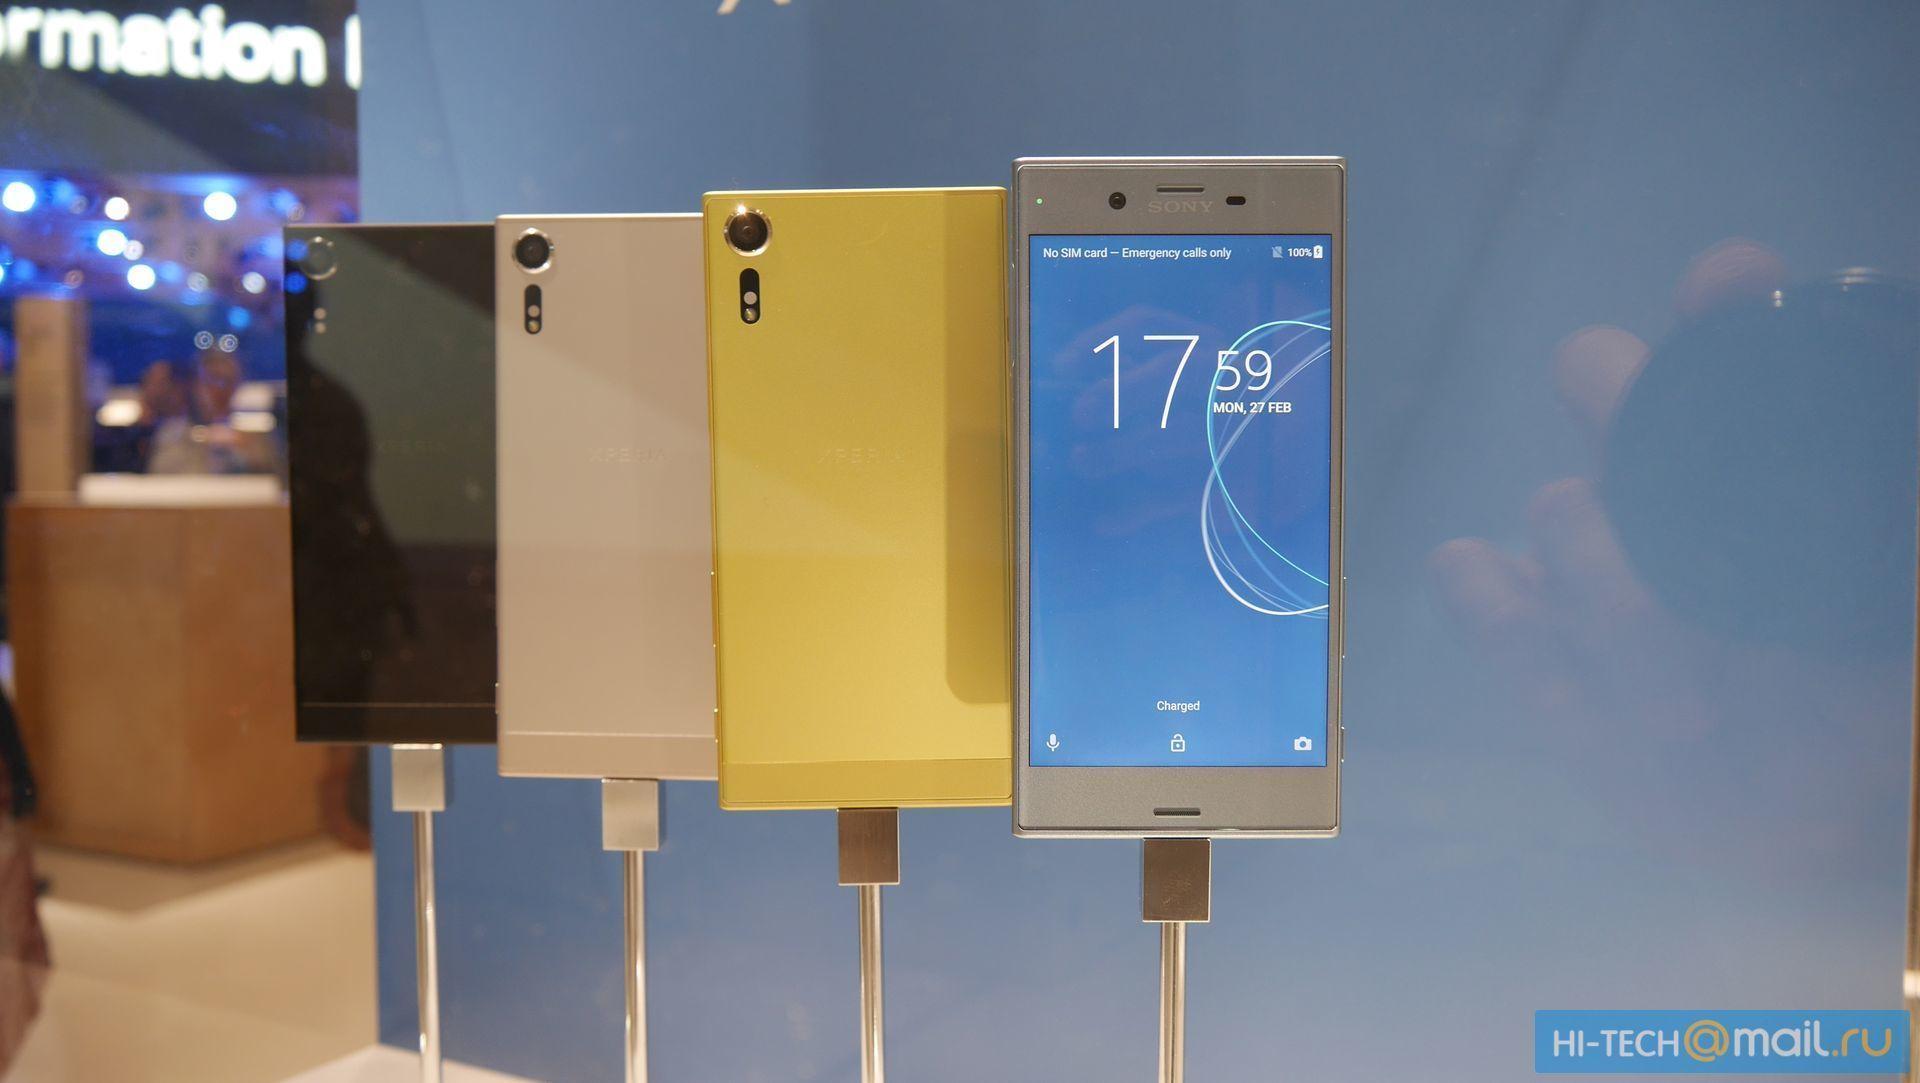 Официально: объявлена цена Sony Xperia XZs в России